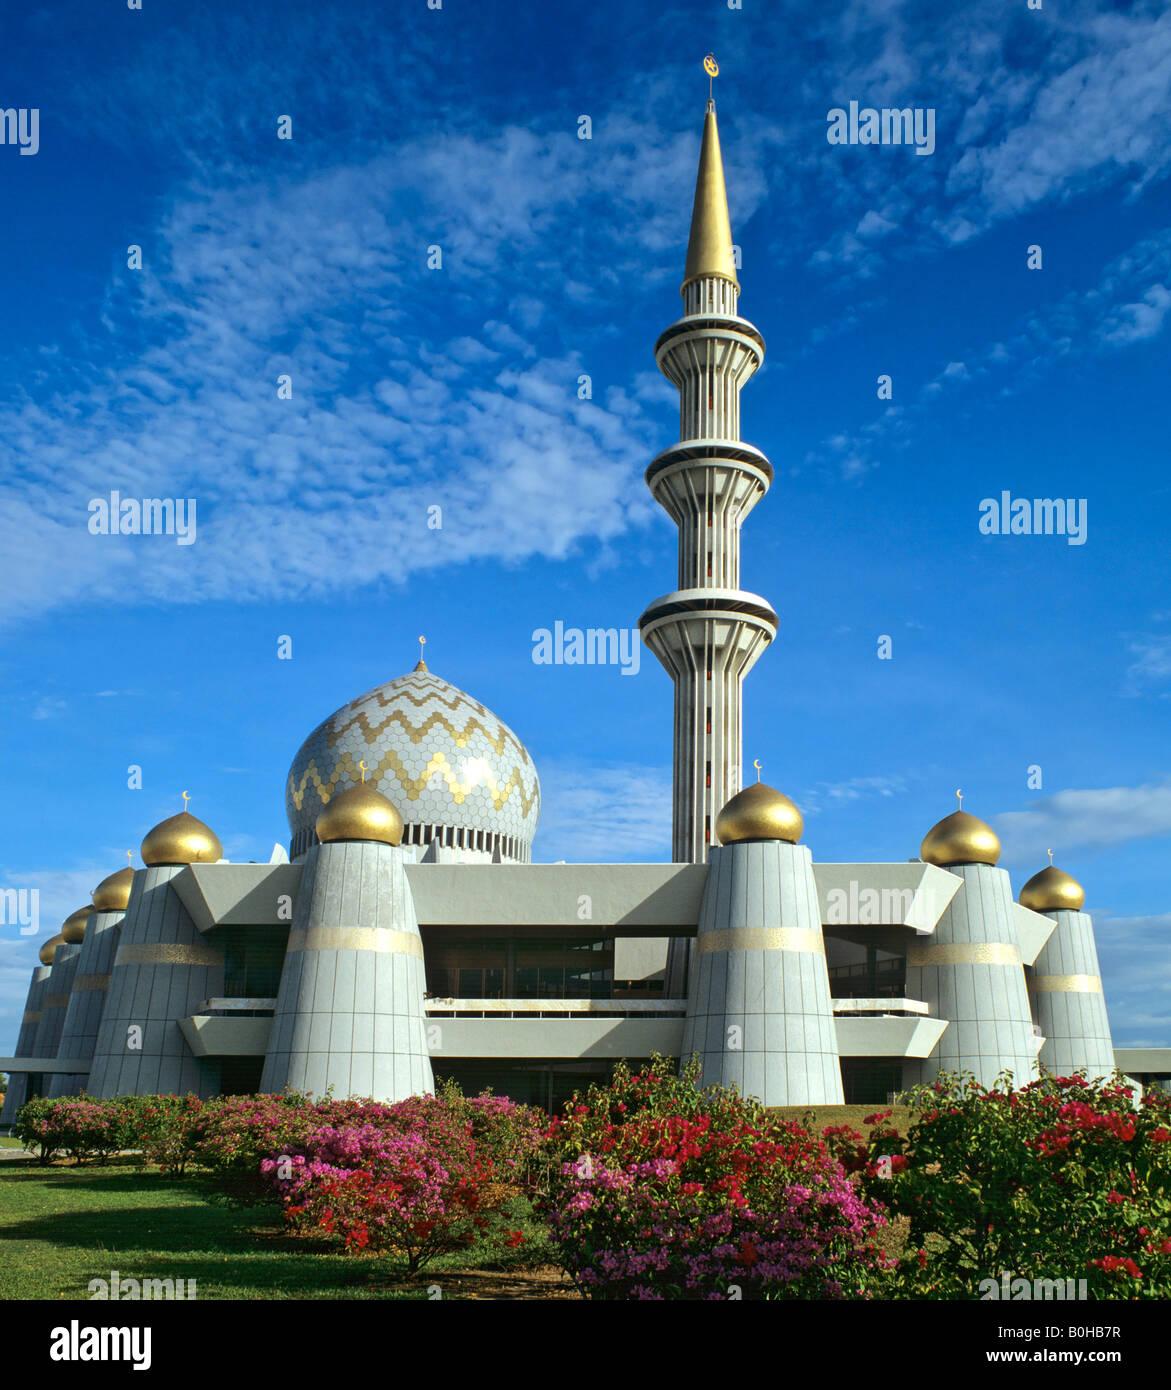 State mosque, minaret, Kota Kinabalu, eastern Malaysia, Sabah, Borneo, Malaysia - Stock Image